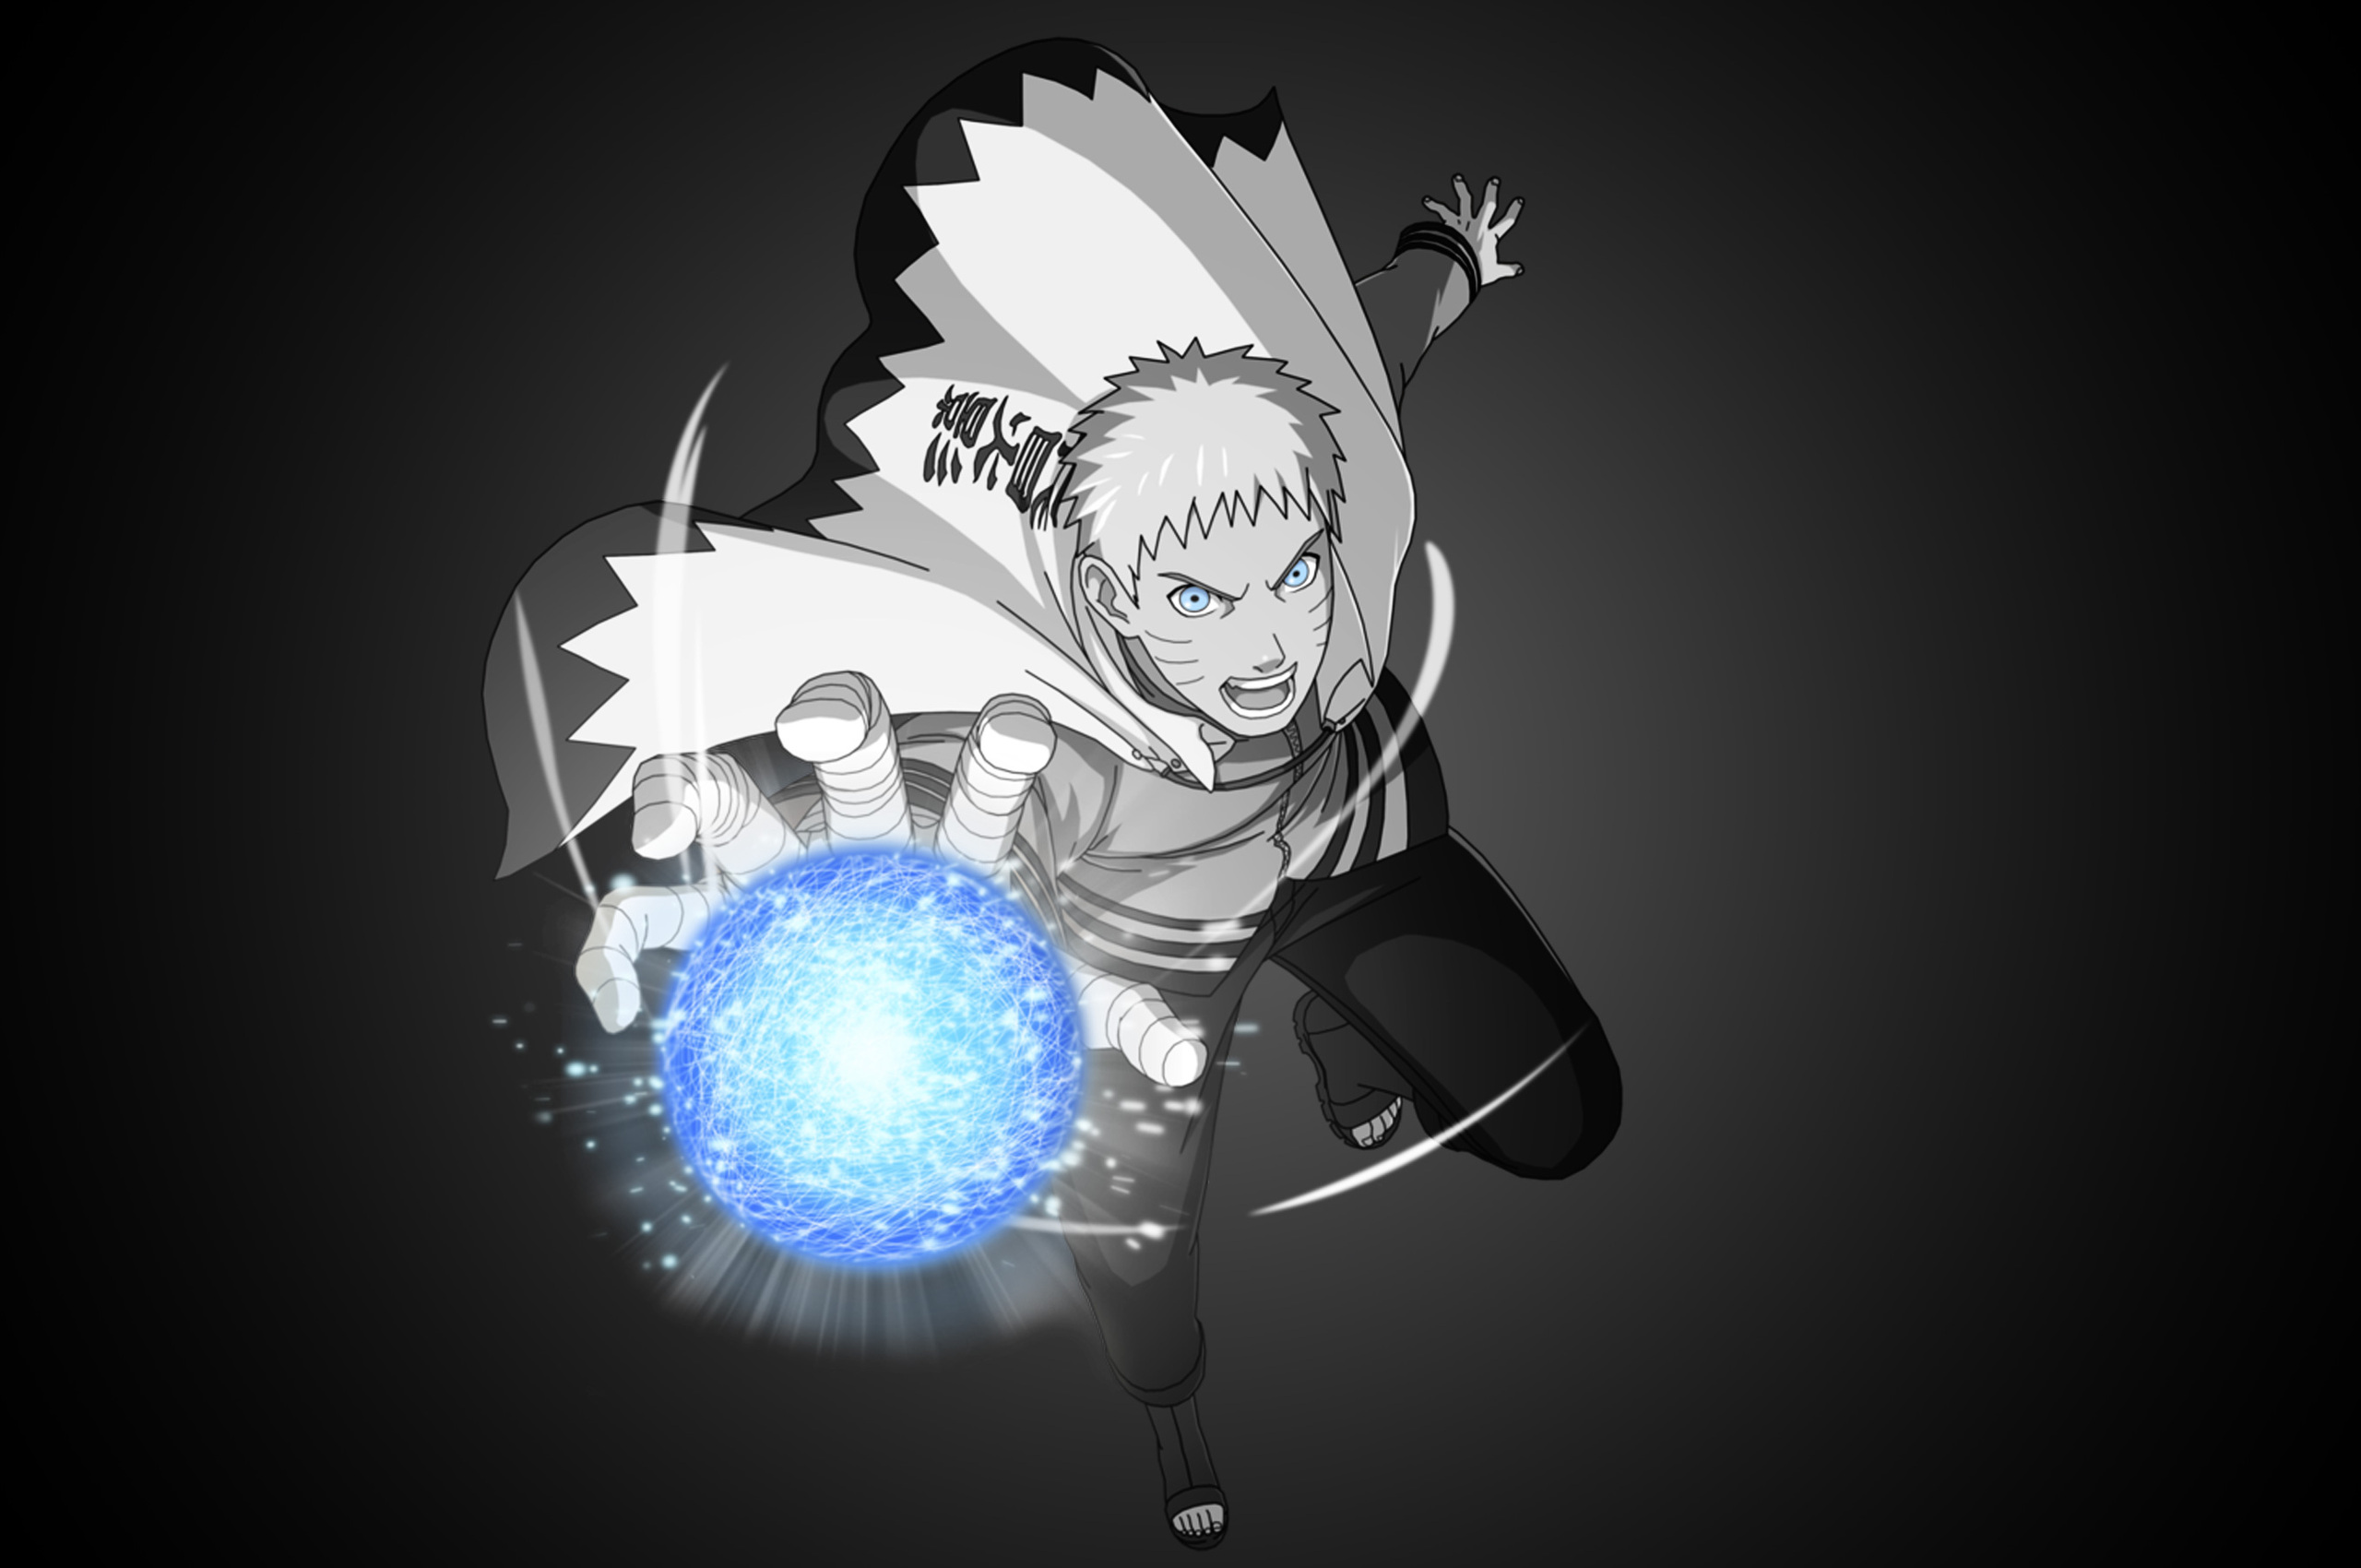 Cool Wallpaper Naruto Chromebook - naruto-rasengan-0y-2560x1700  Picture_455482.jpg